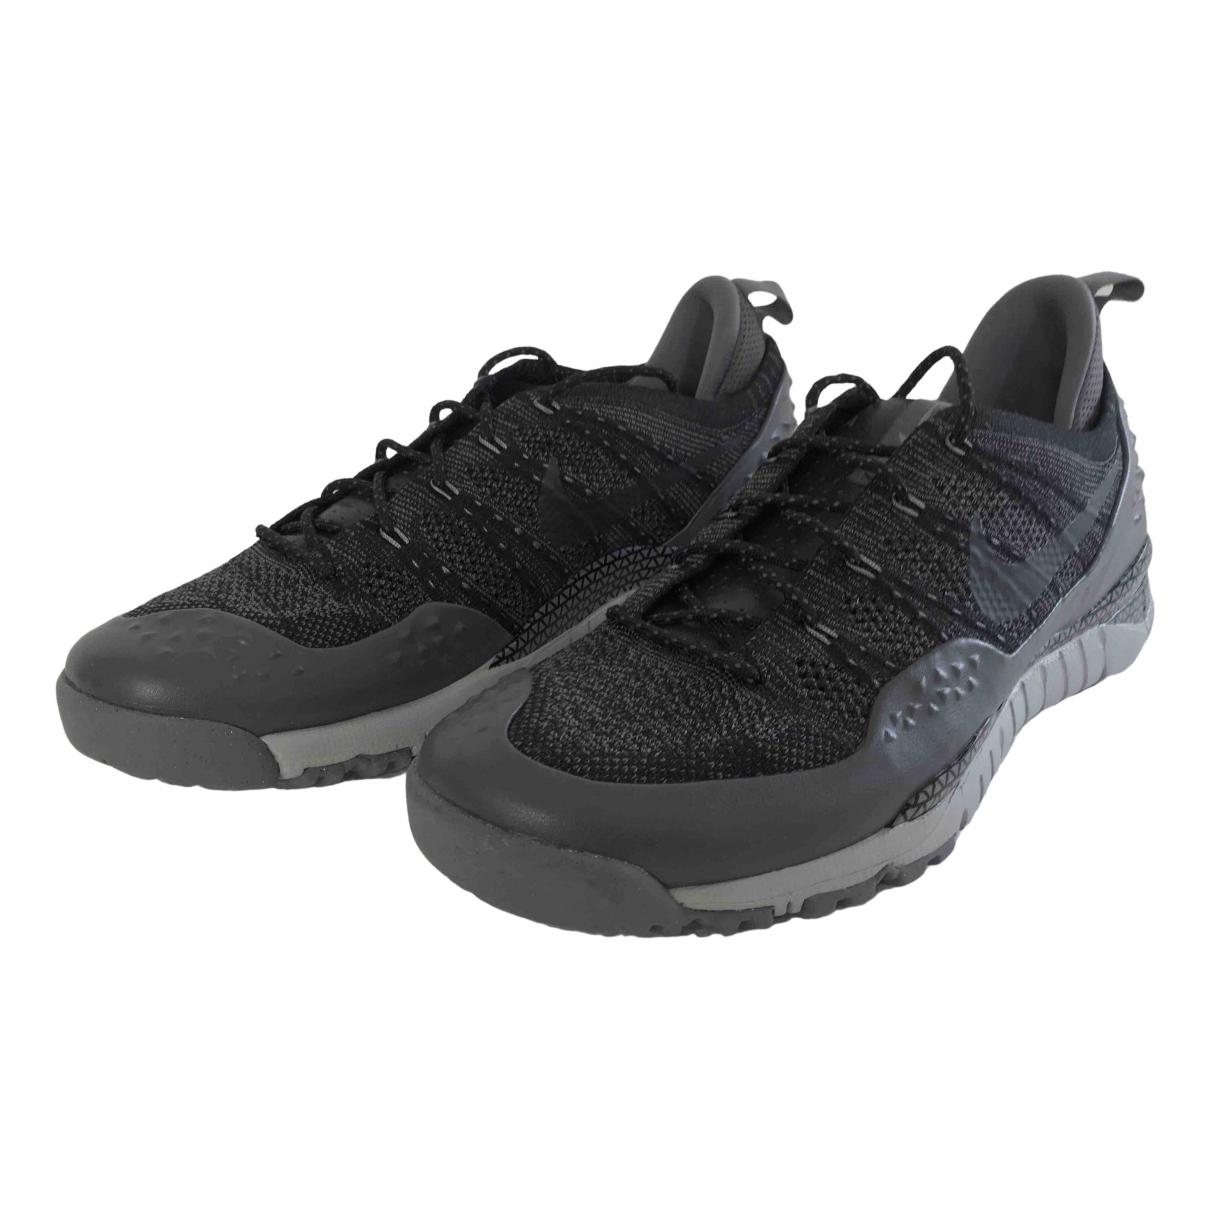 Nike Acg - Baskets   pour homme en toile - anthracite